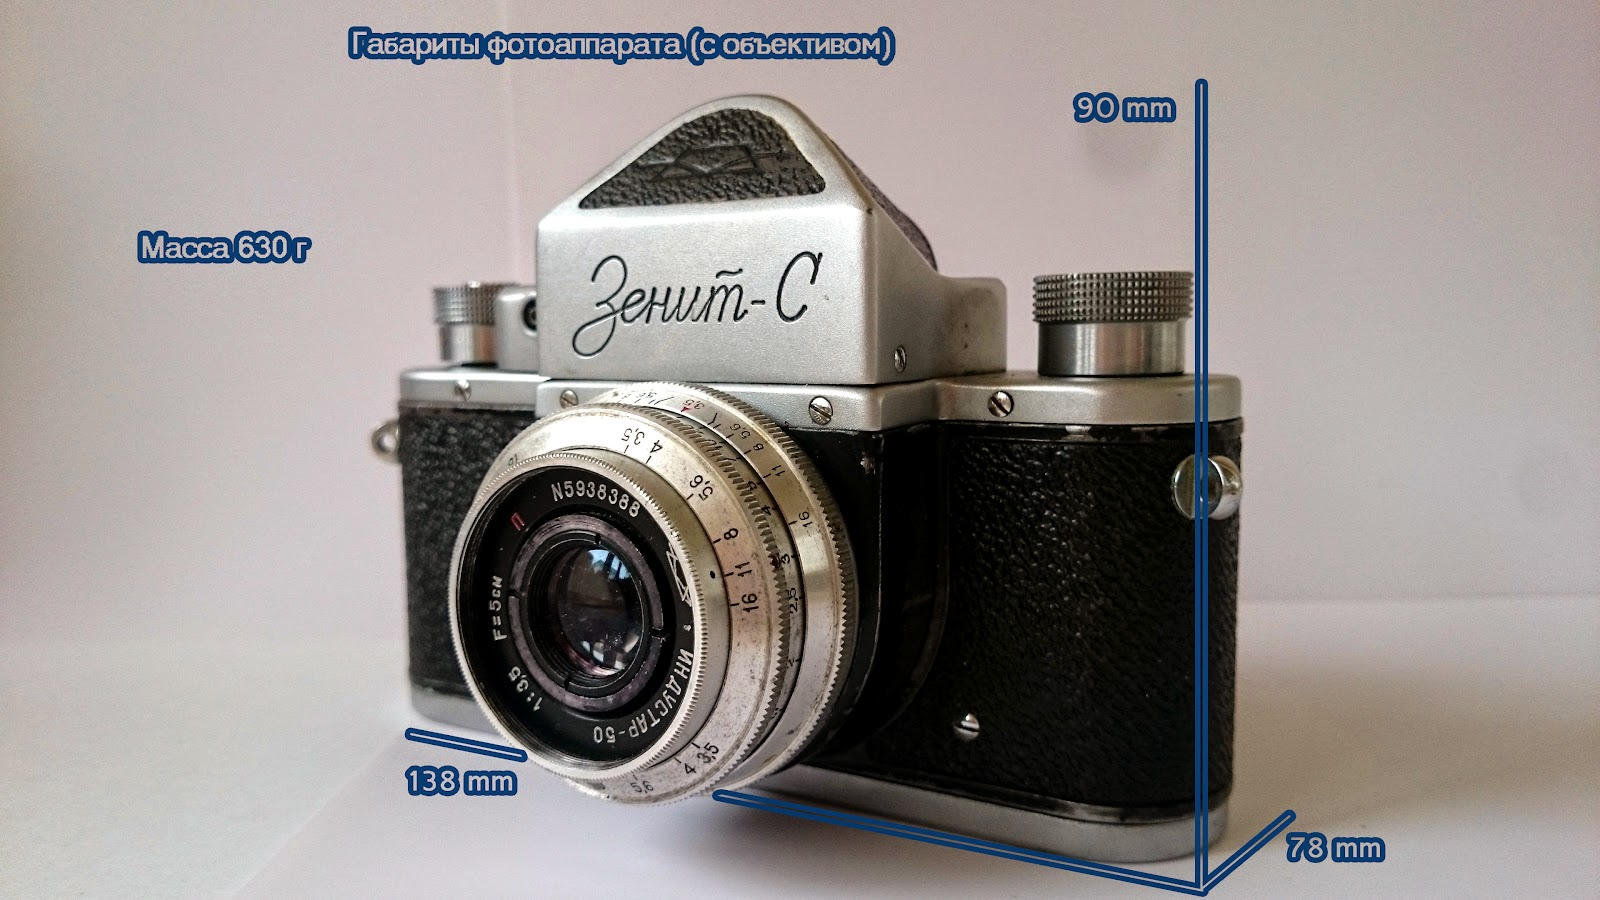 Цифровой фотоаппарат из зенита своими руками 75